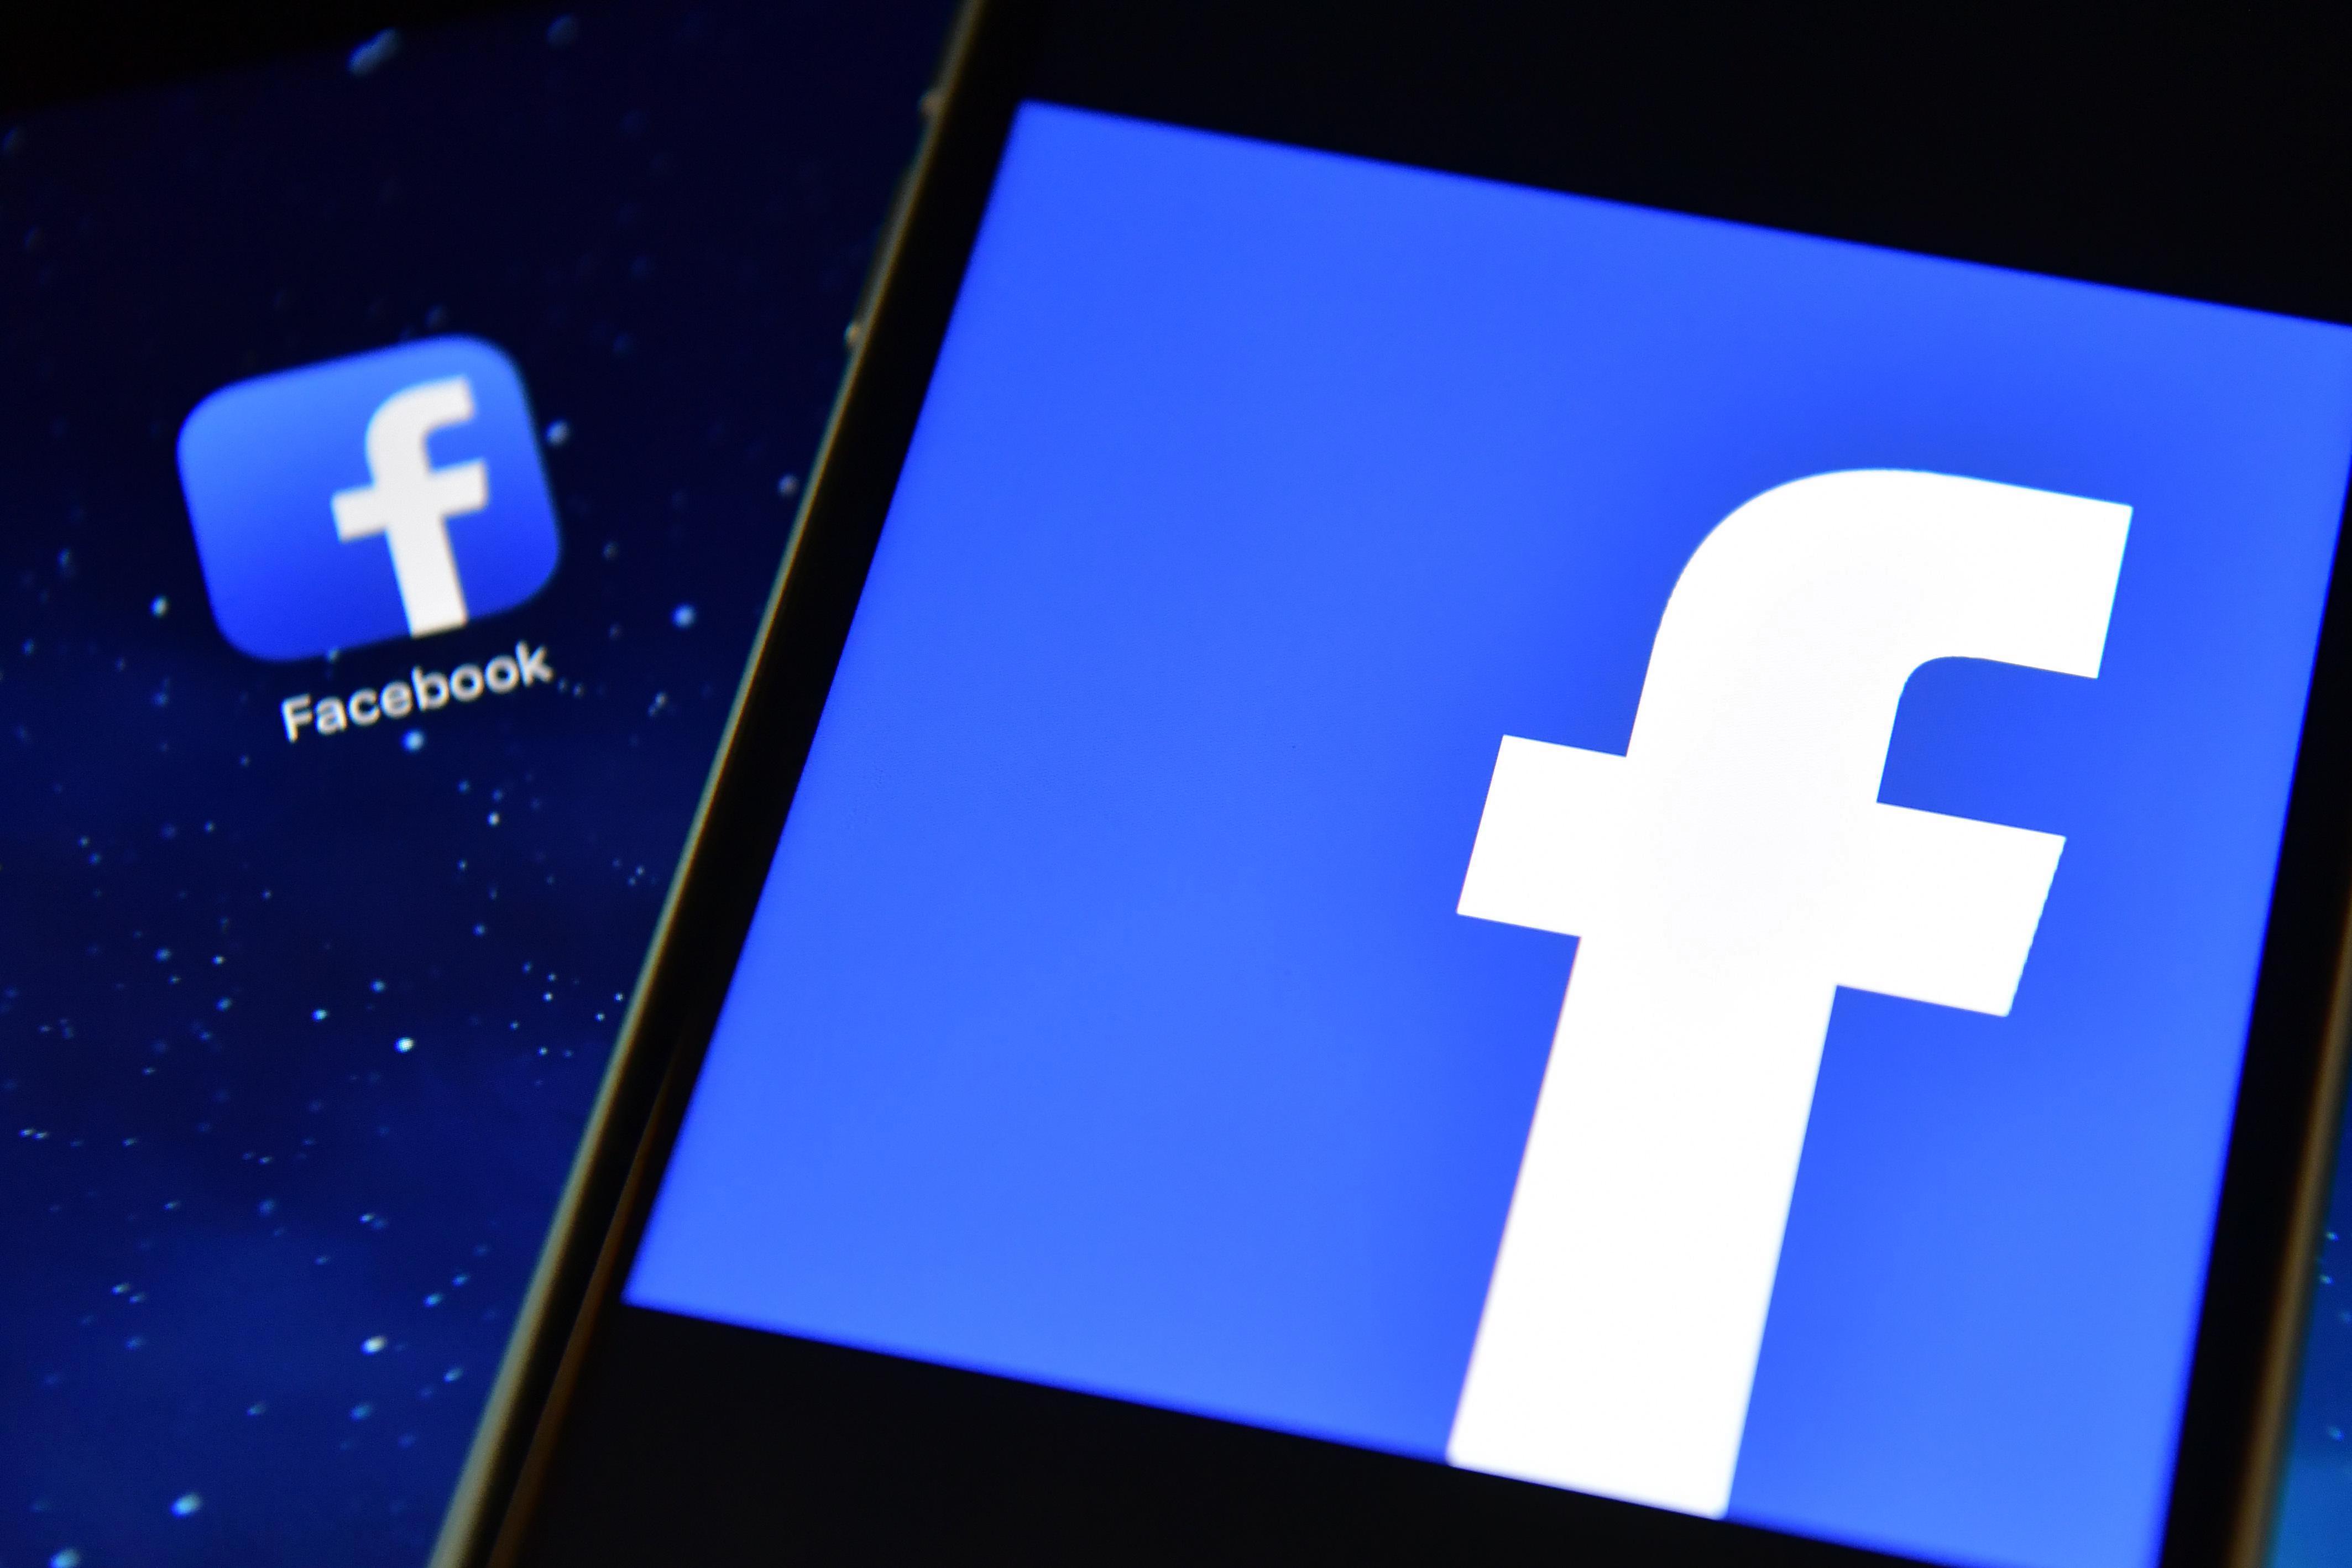 У Facebook стався черговий витік даних